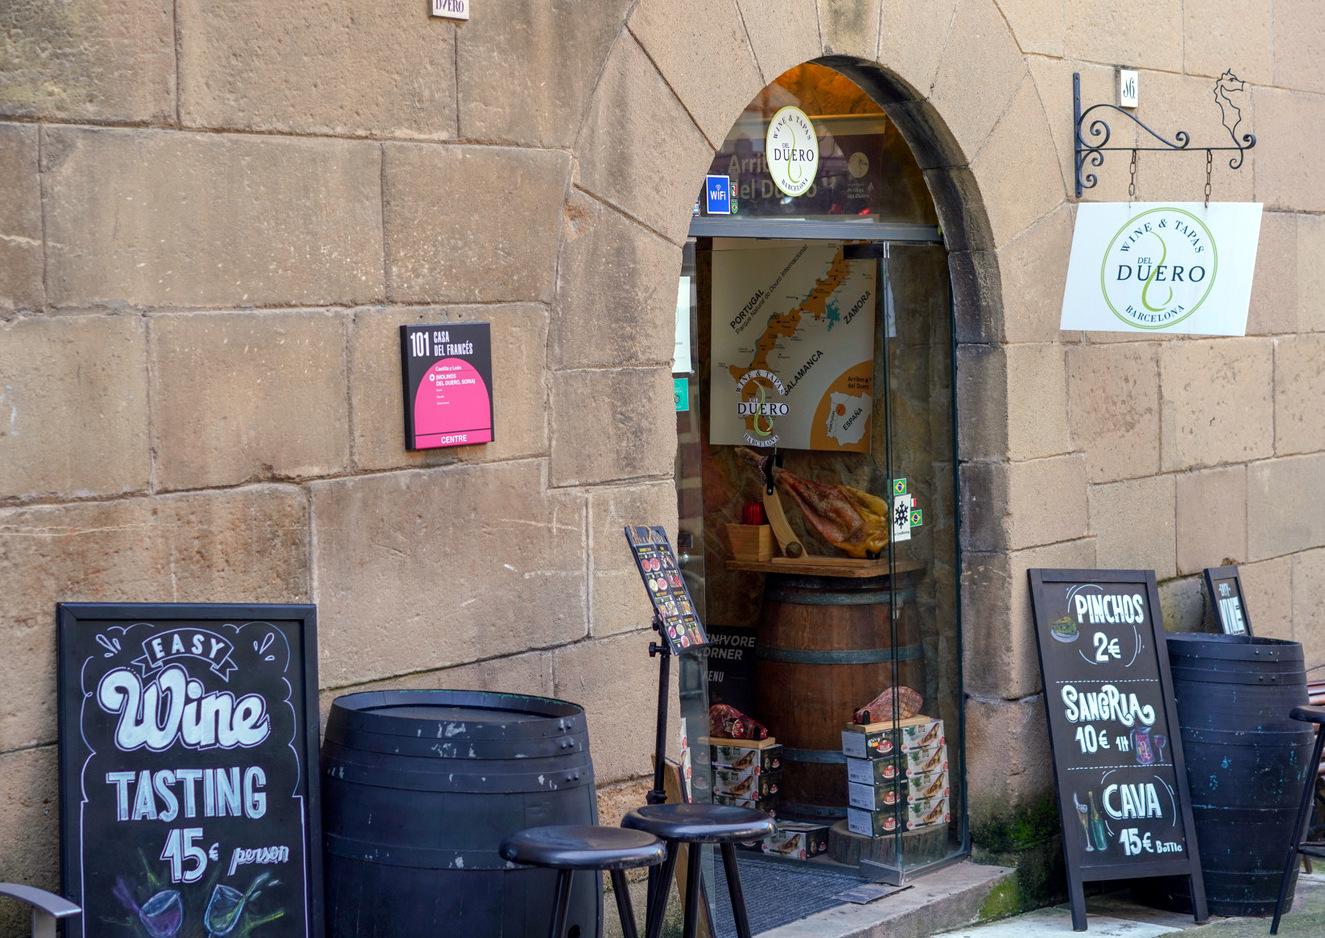 wine & tapas del duero, barcelona